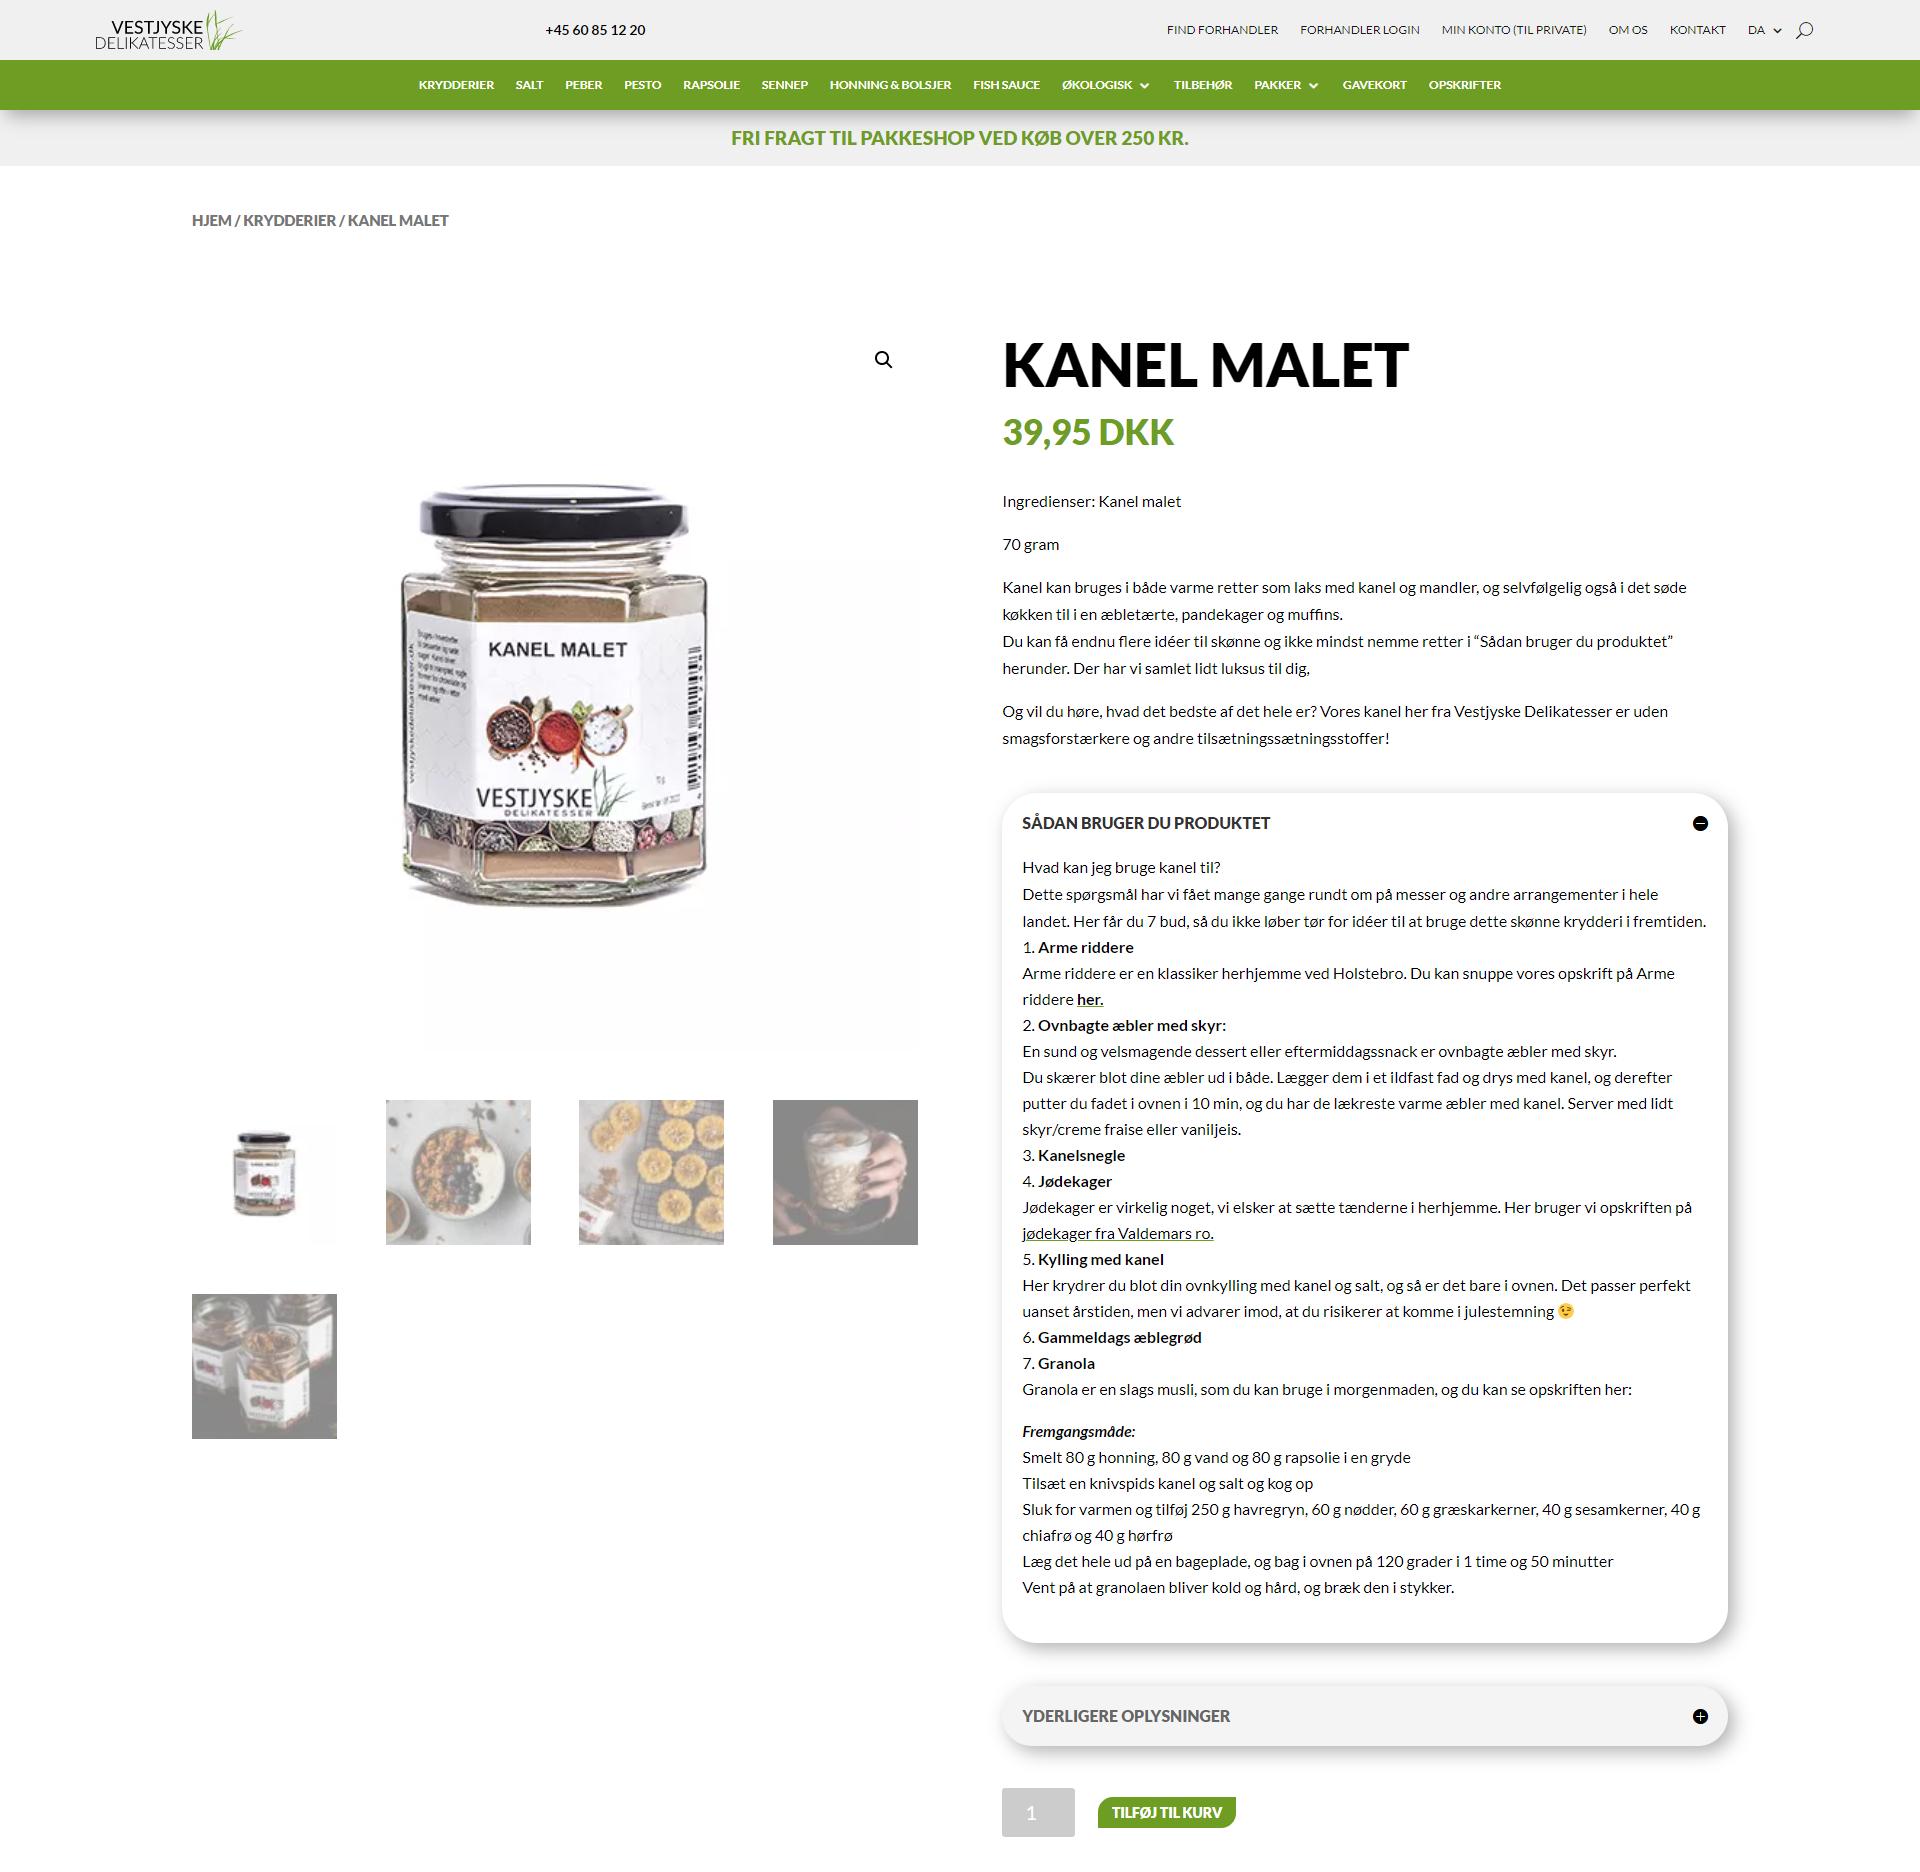 Vestjyske Delikatesser - Kanel produkttekst